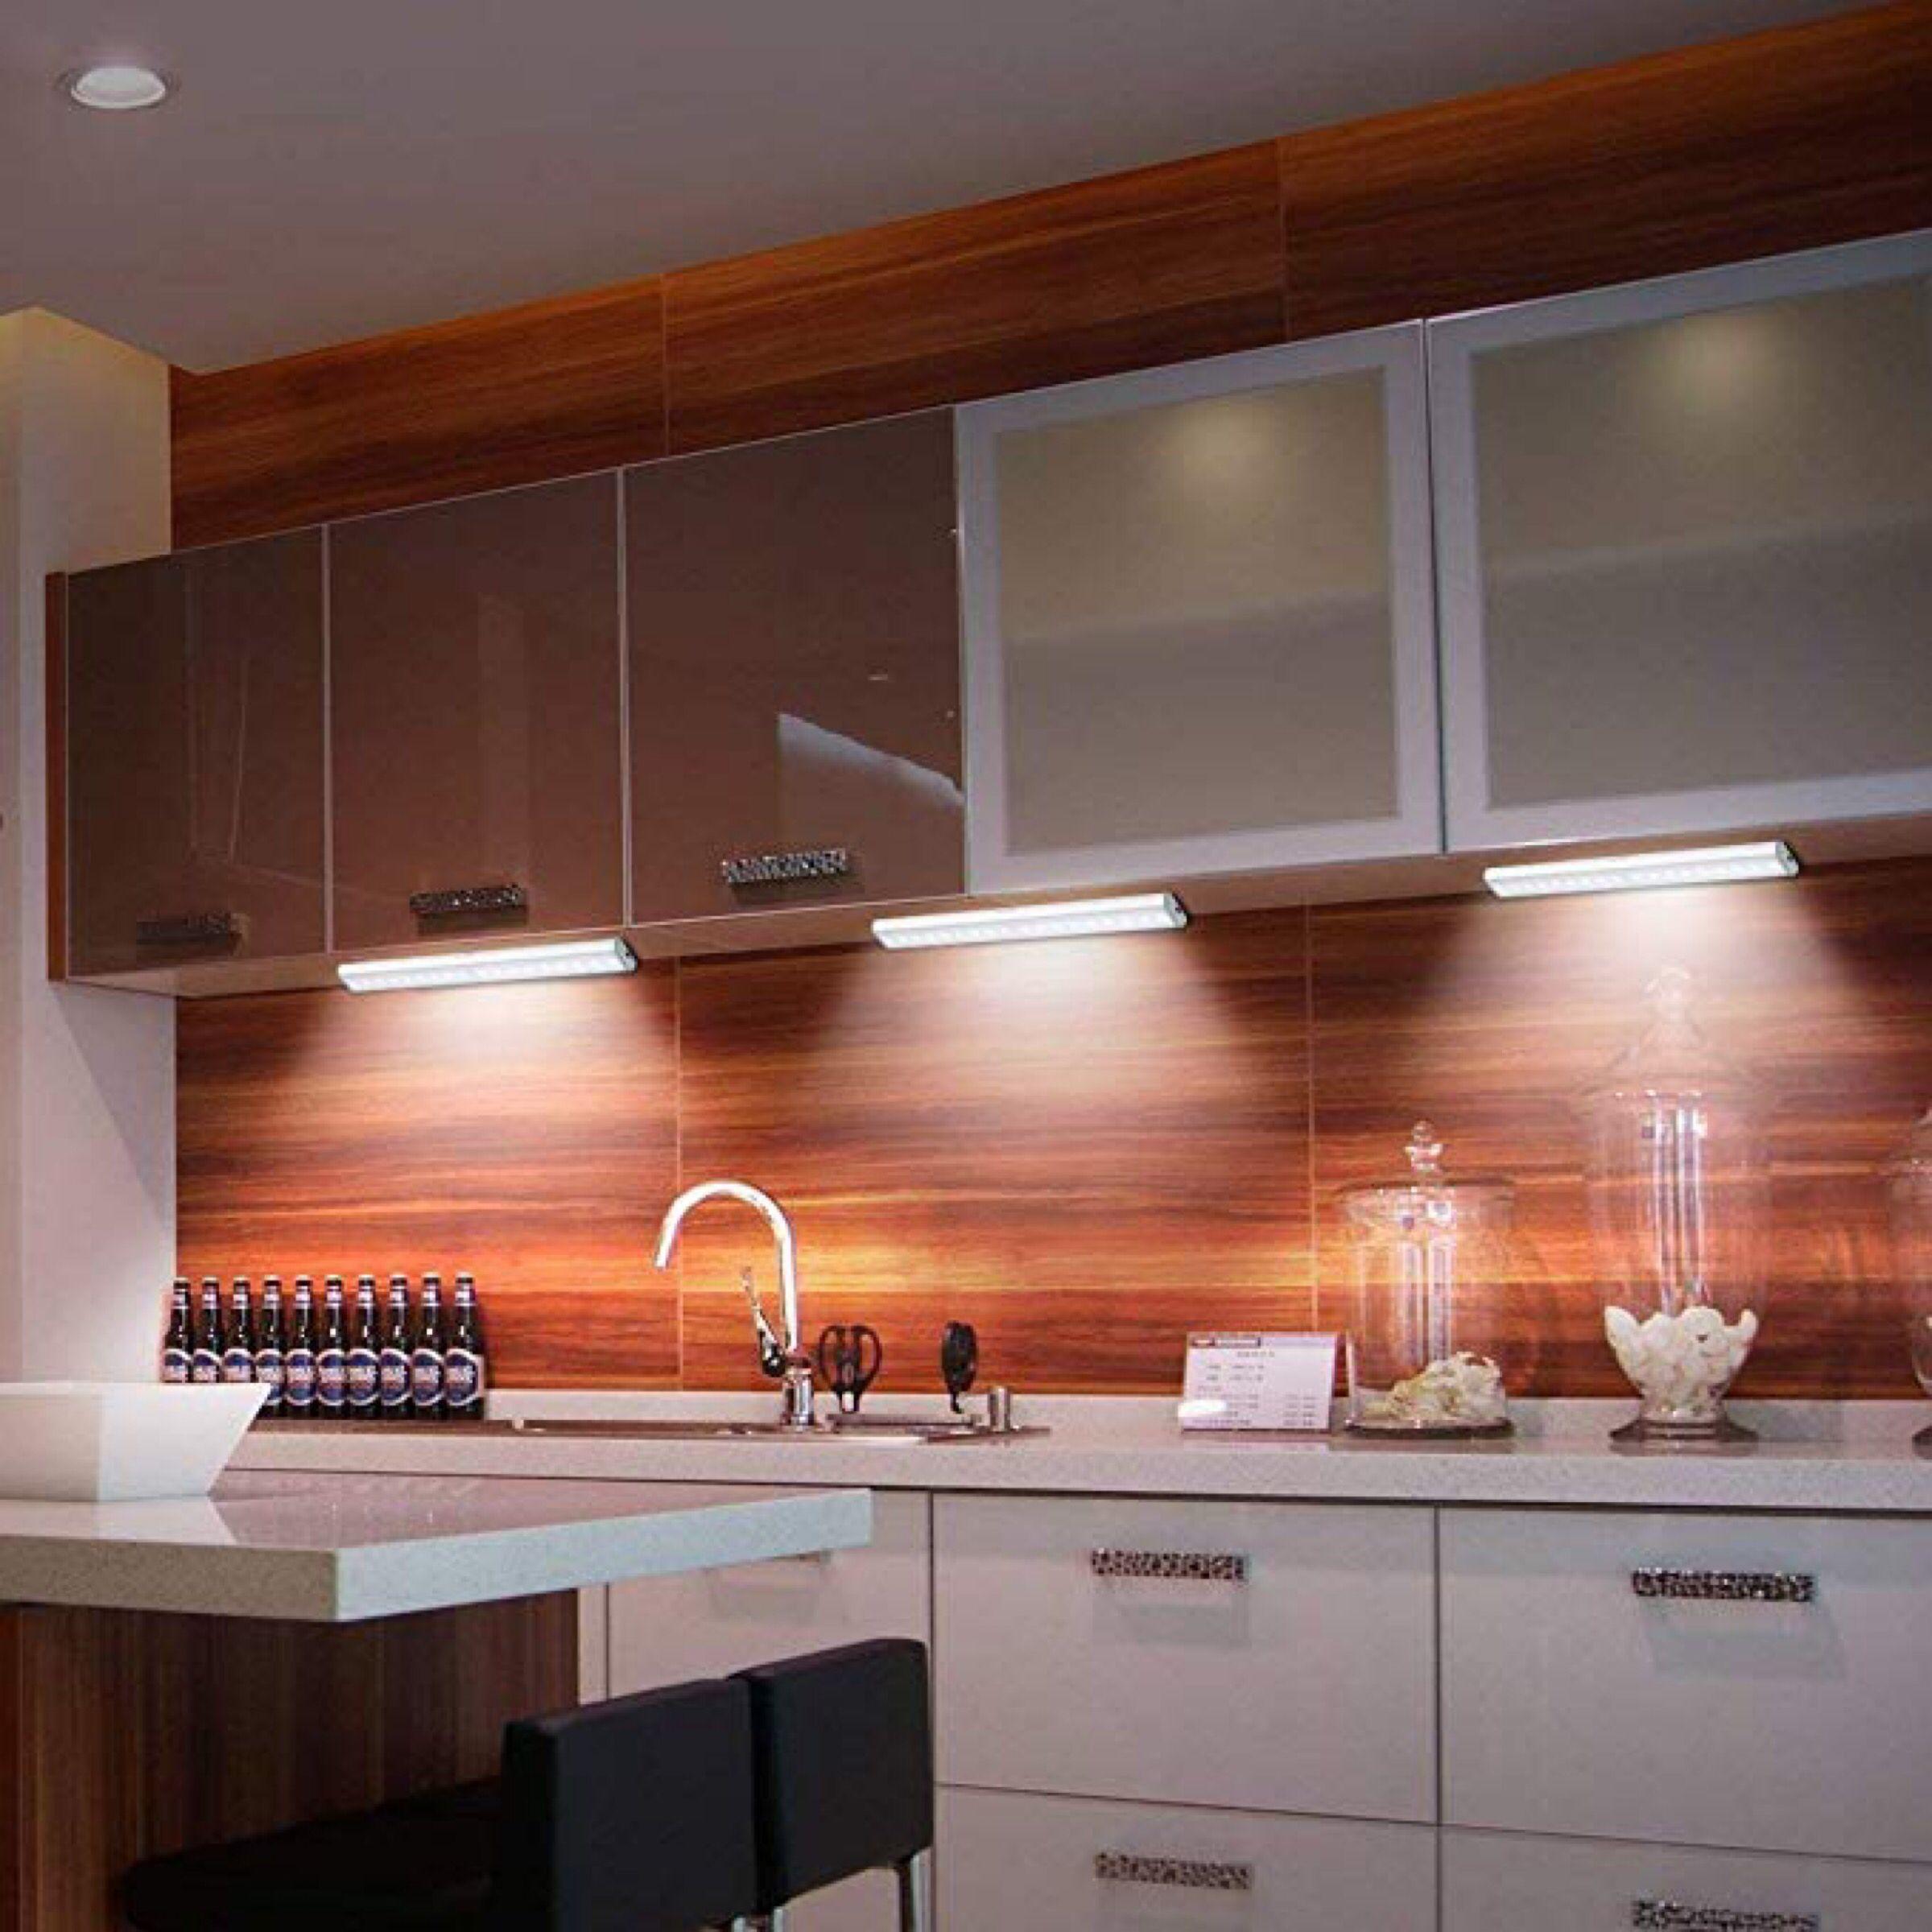 Under Cabinet Lights, 18 LED Motion Sensor Lights, Stick On Light To  Anywhere Rechargeable LED Lights, Night Light, Led Cabinet Light, Wireless  Led Closet ...